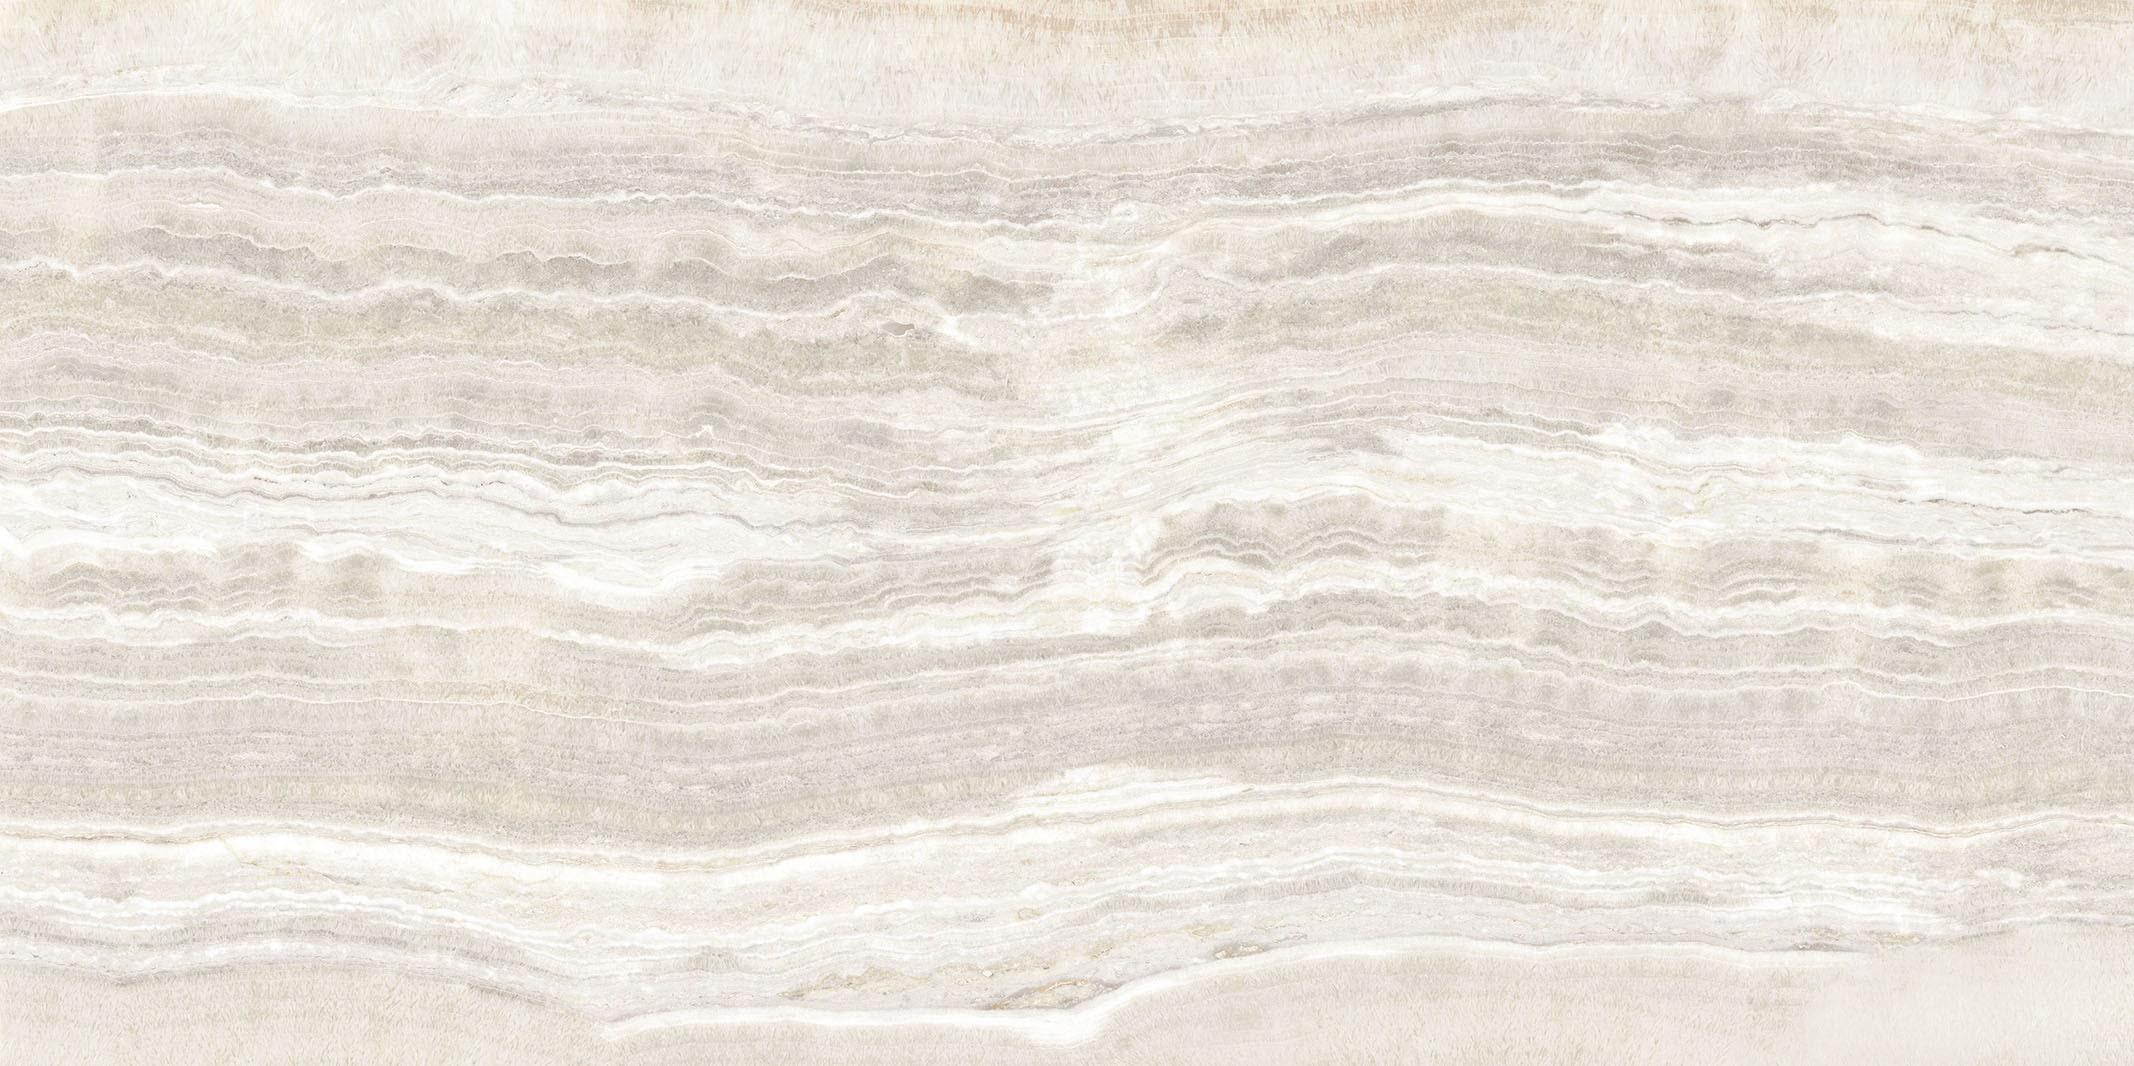 Onyx of Cerim Sand Glossy 10mm 60 x 120